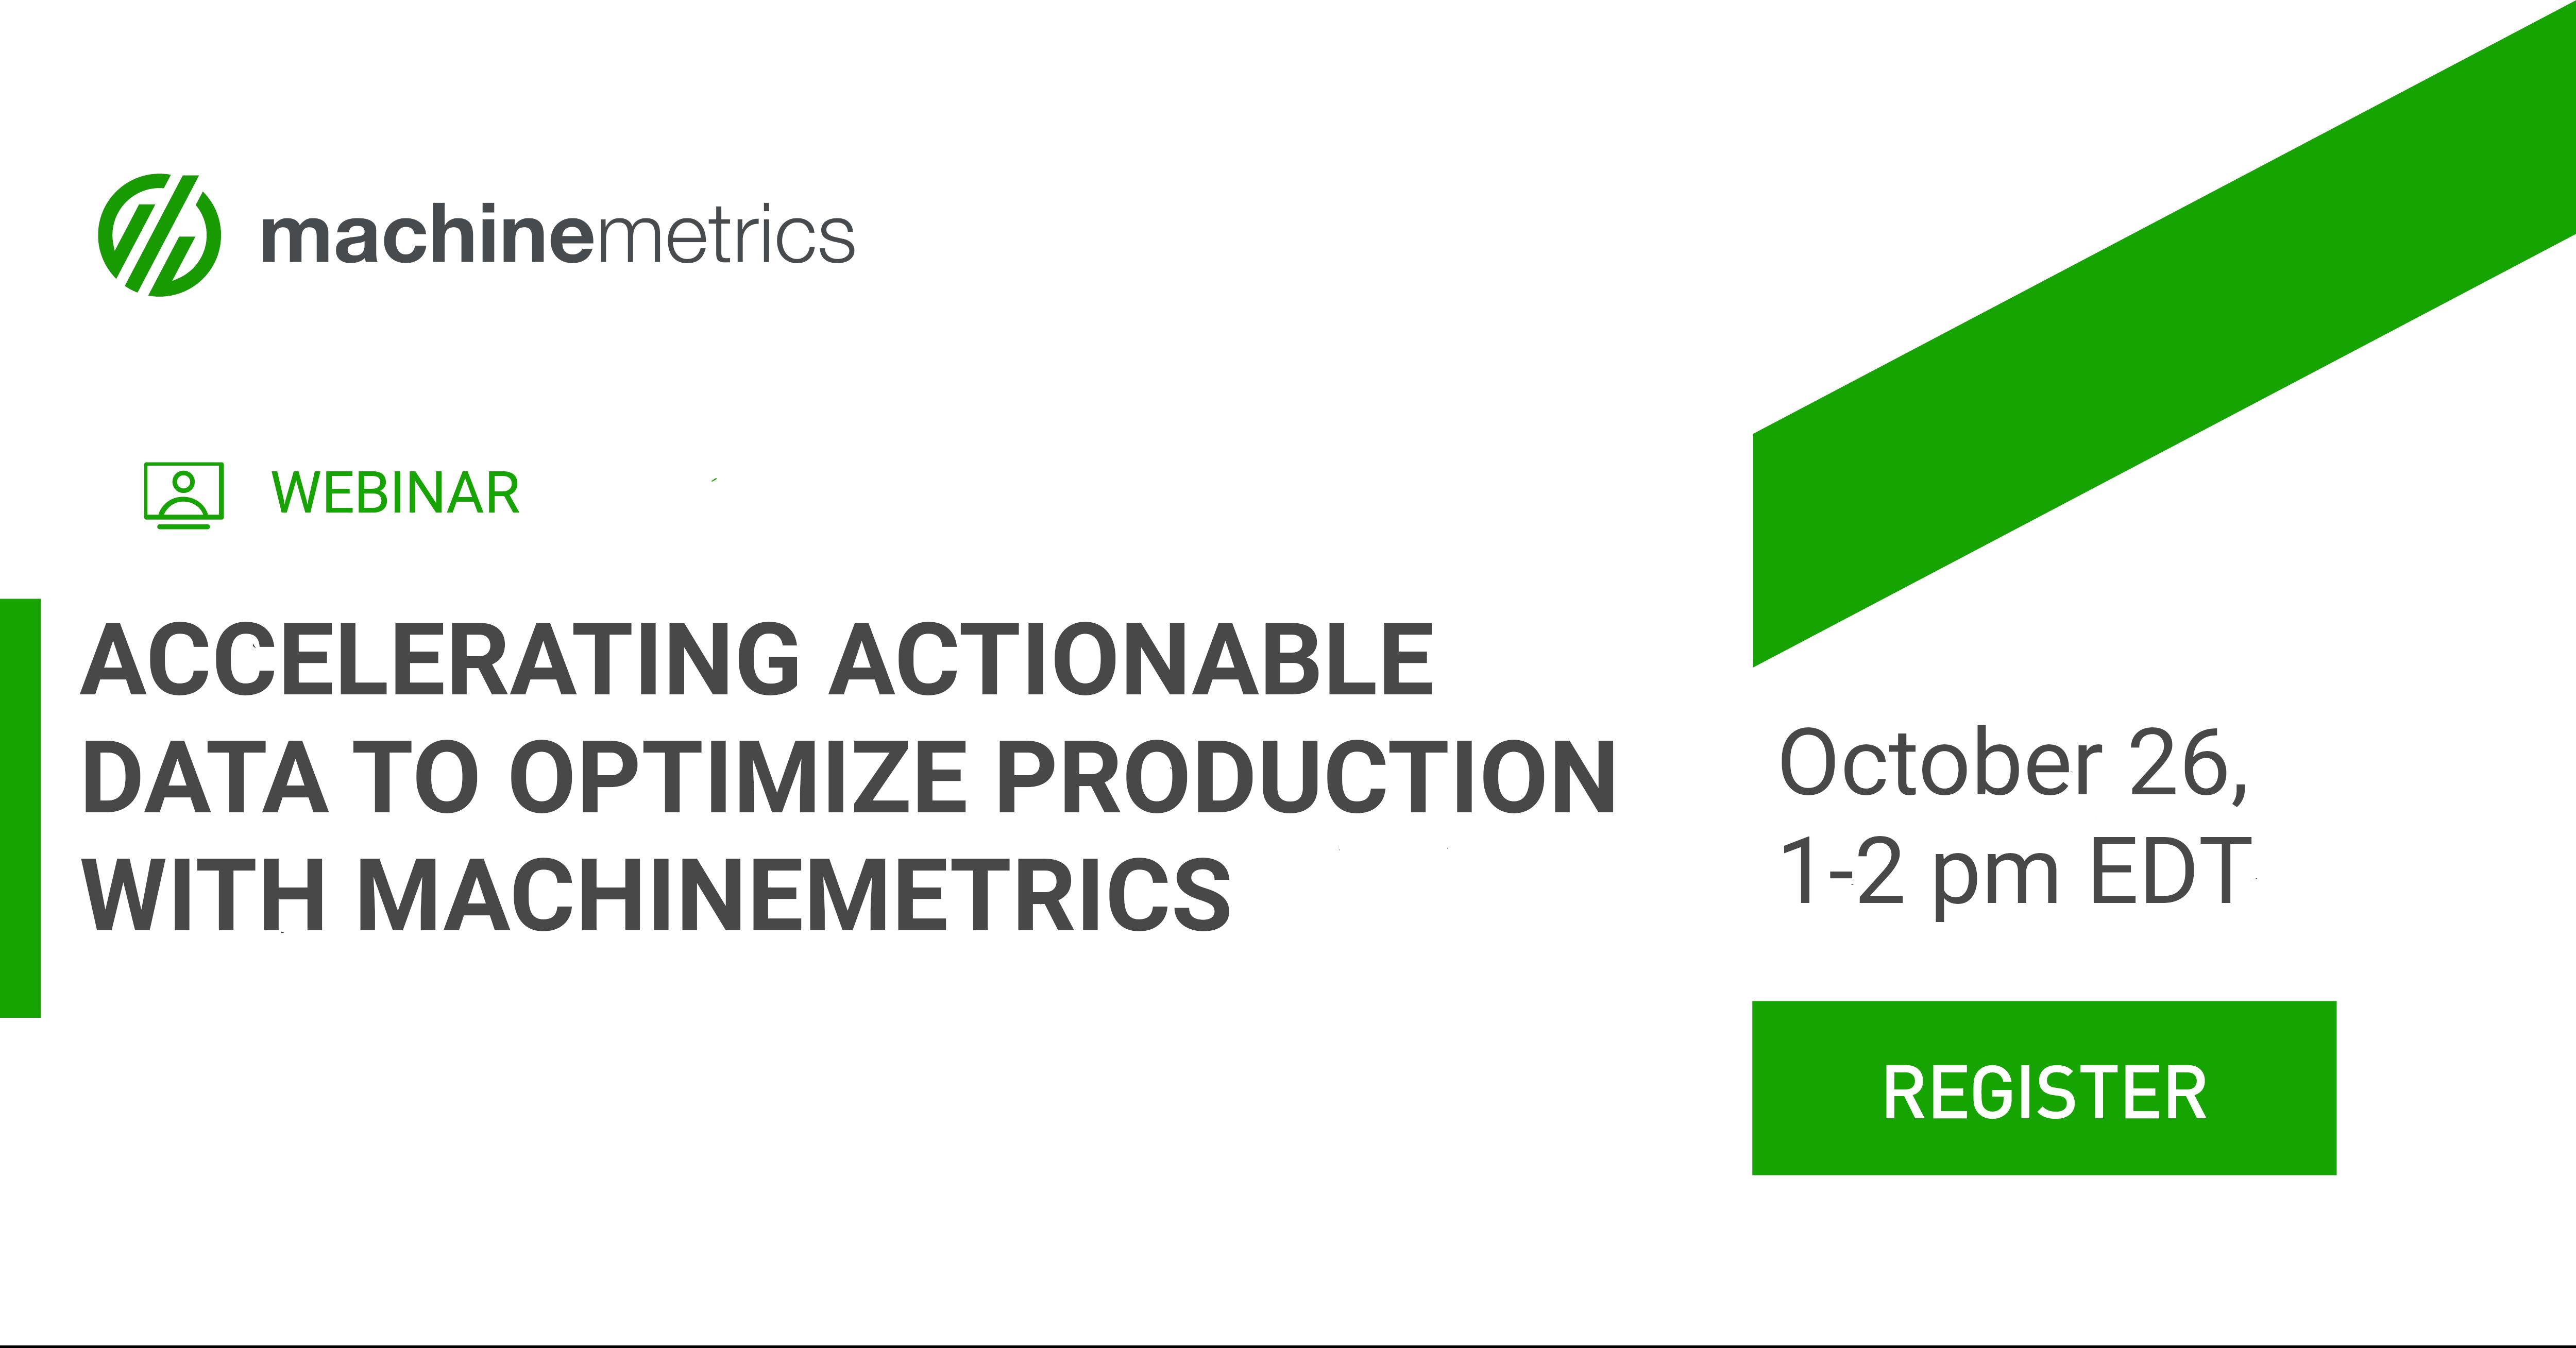 Accelerating Actionable Data to Optimize Production with MachineMetrics Webinar Metagimage